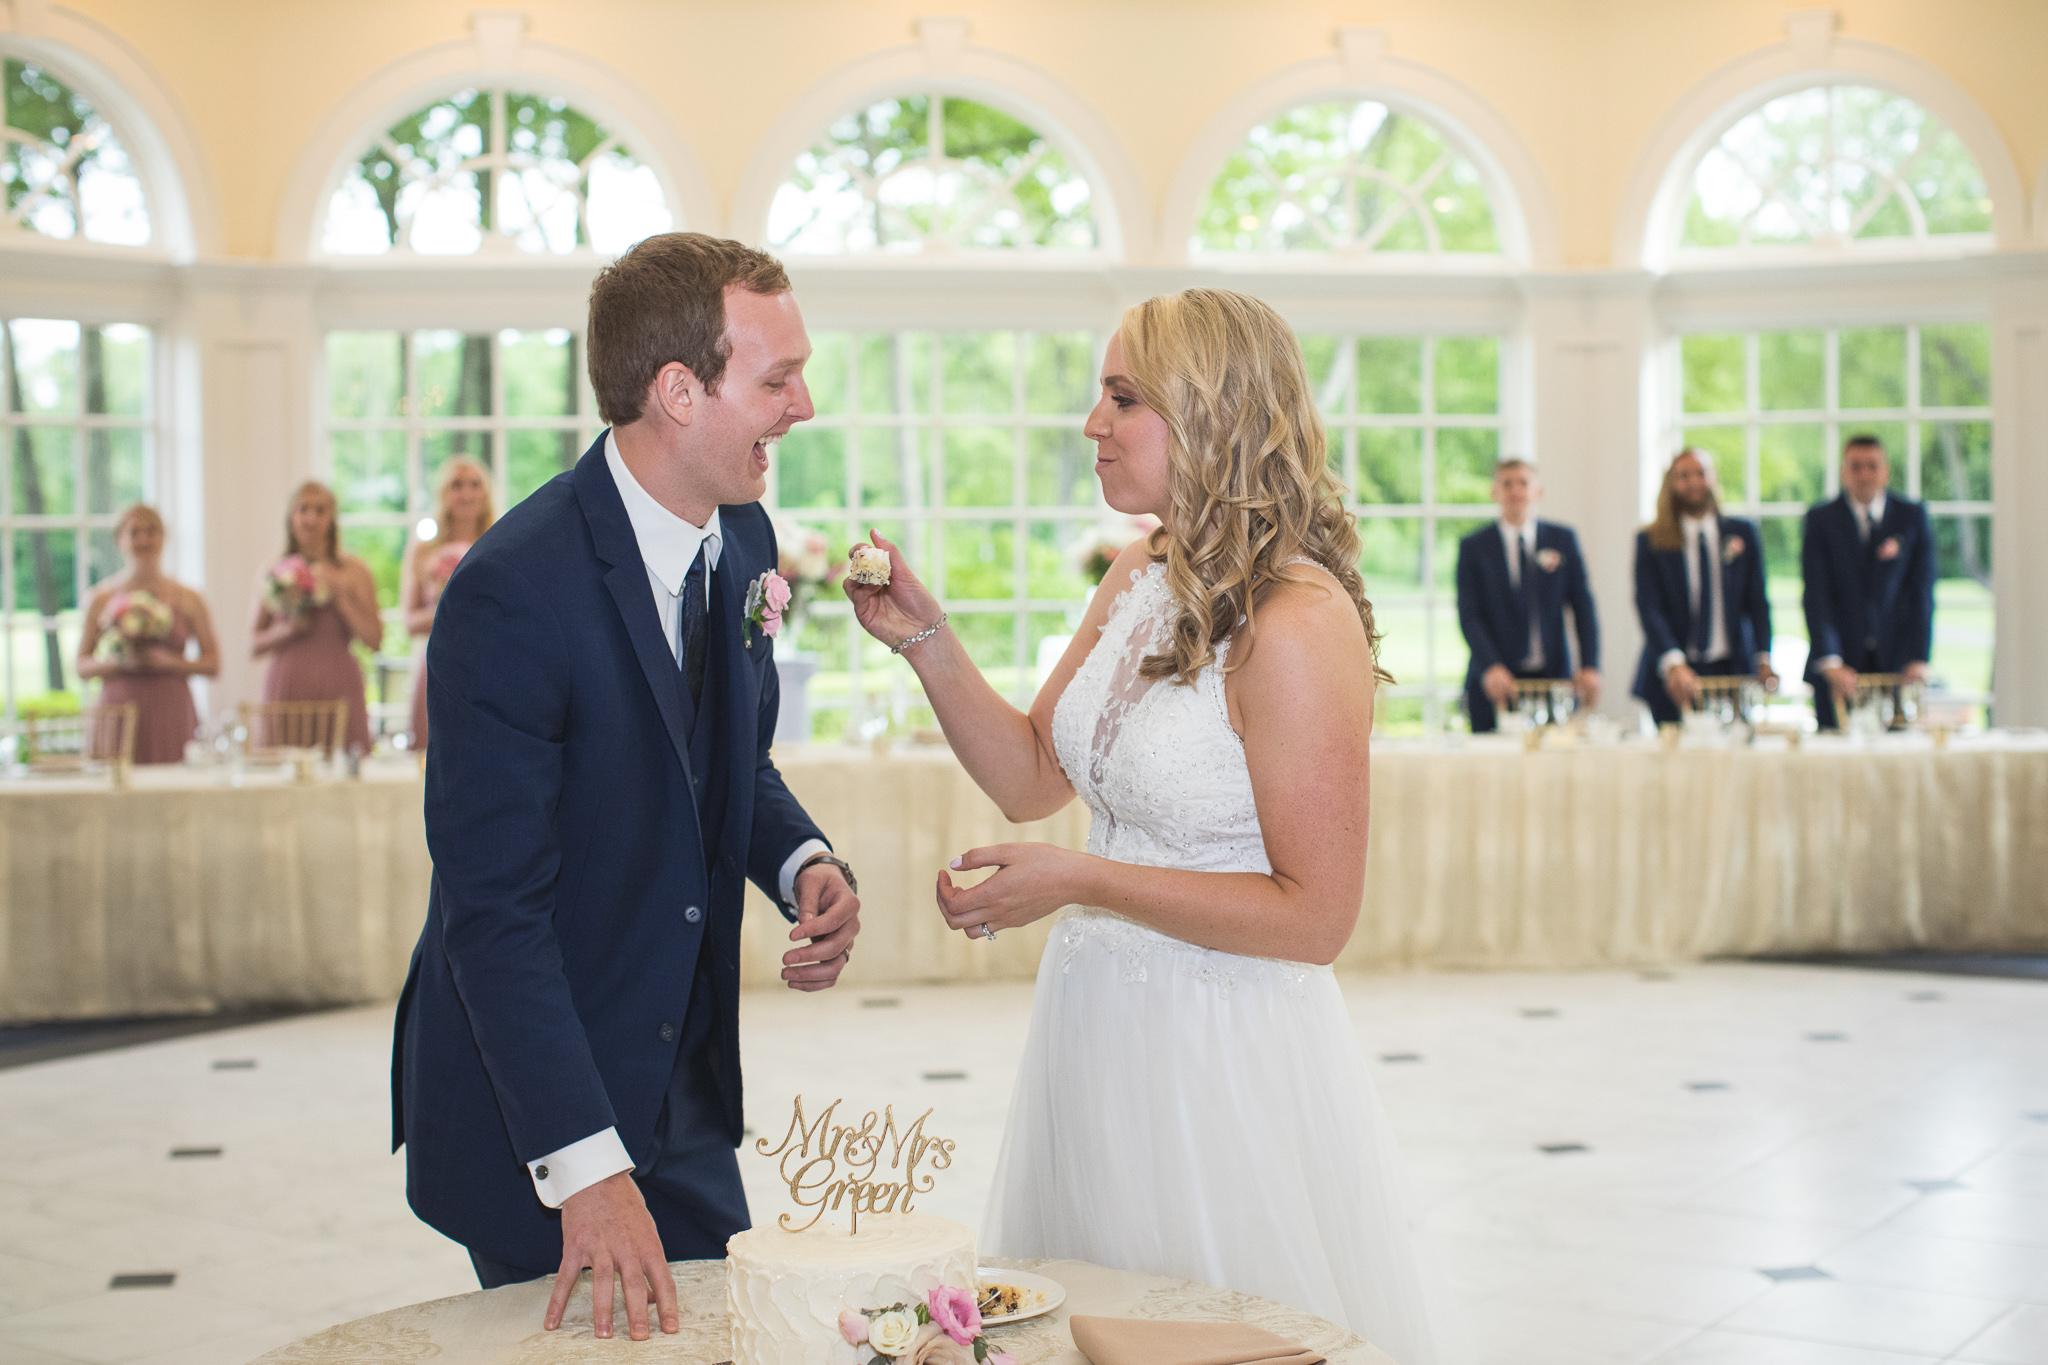 129-best-detroit-michigan-outdoor-wedding-photographer.jpg